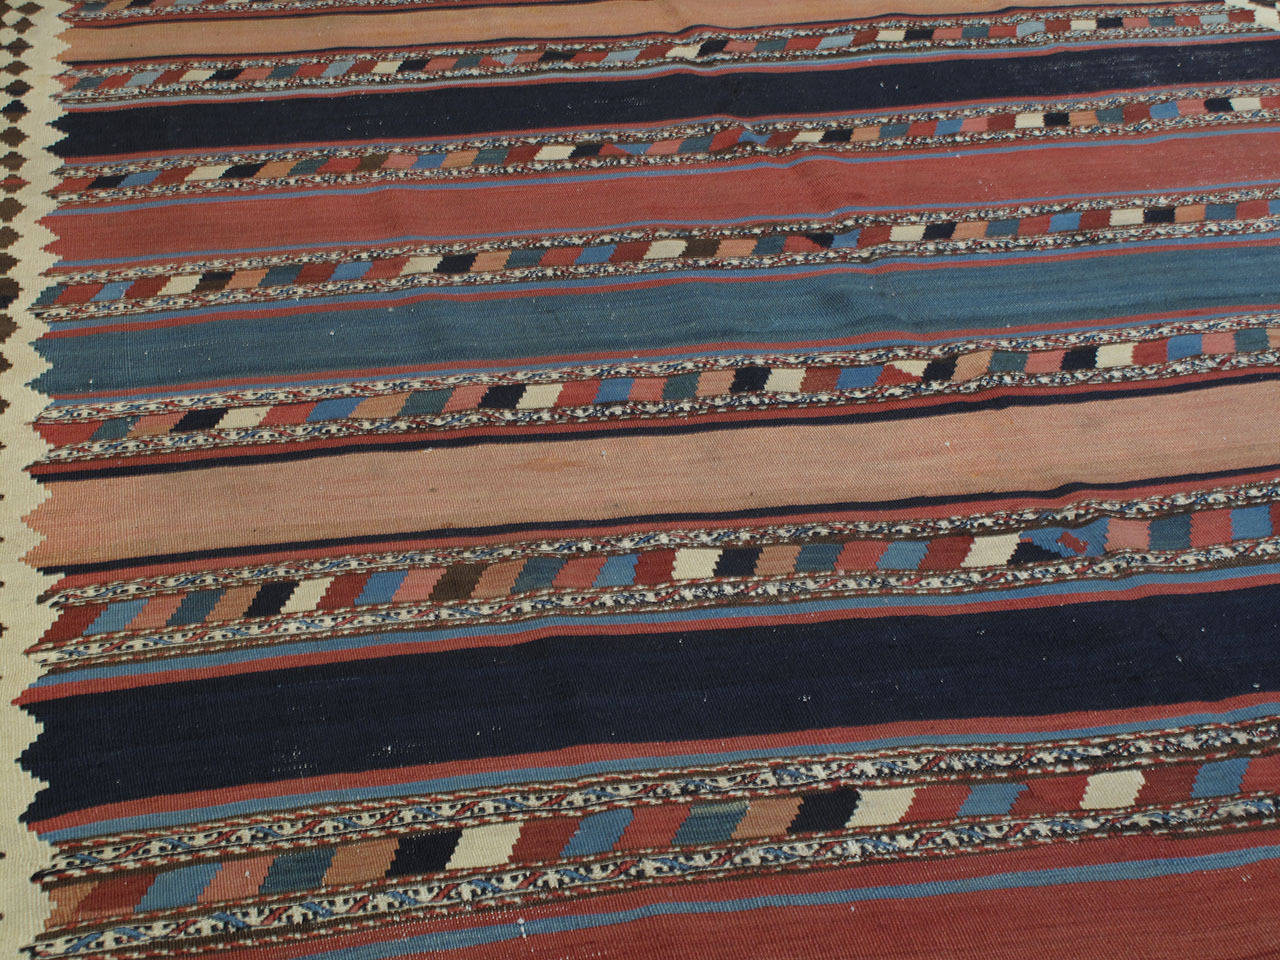 Azerbaijani Antique Shahsavan Kilim Rug For Sale